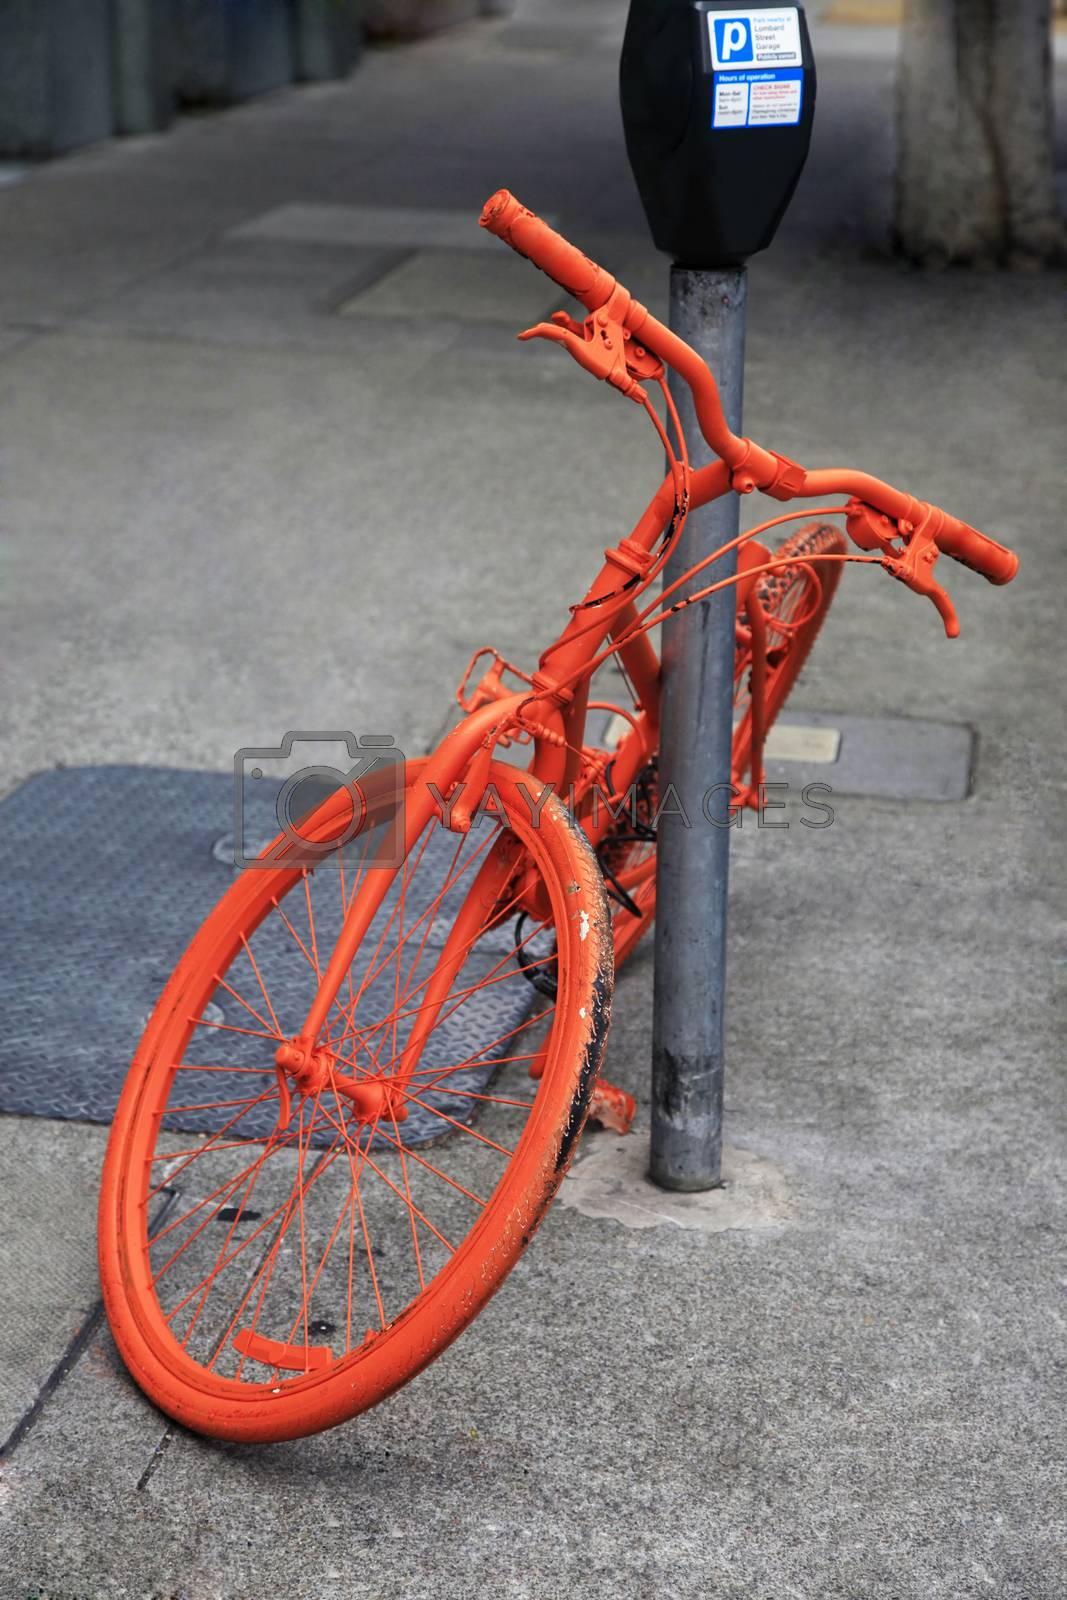 Parked orange bike in San Francisco